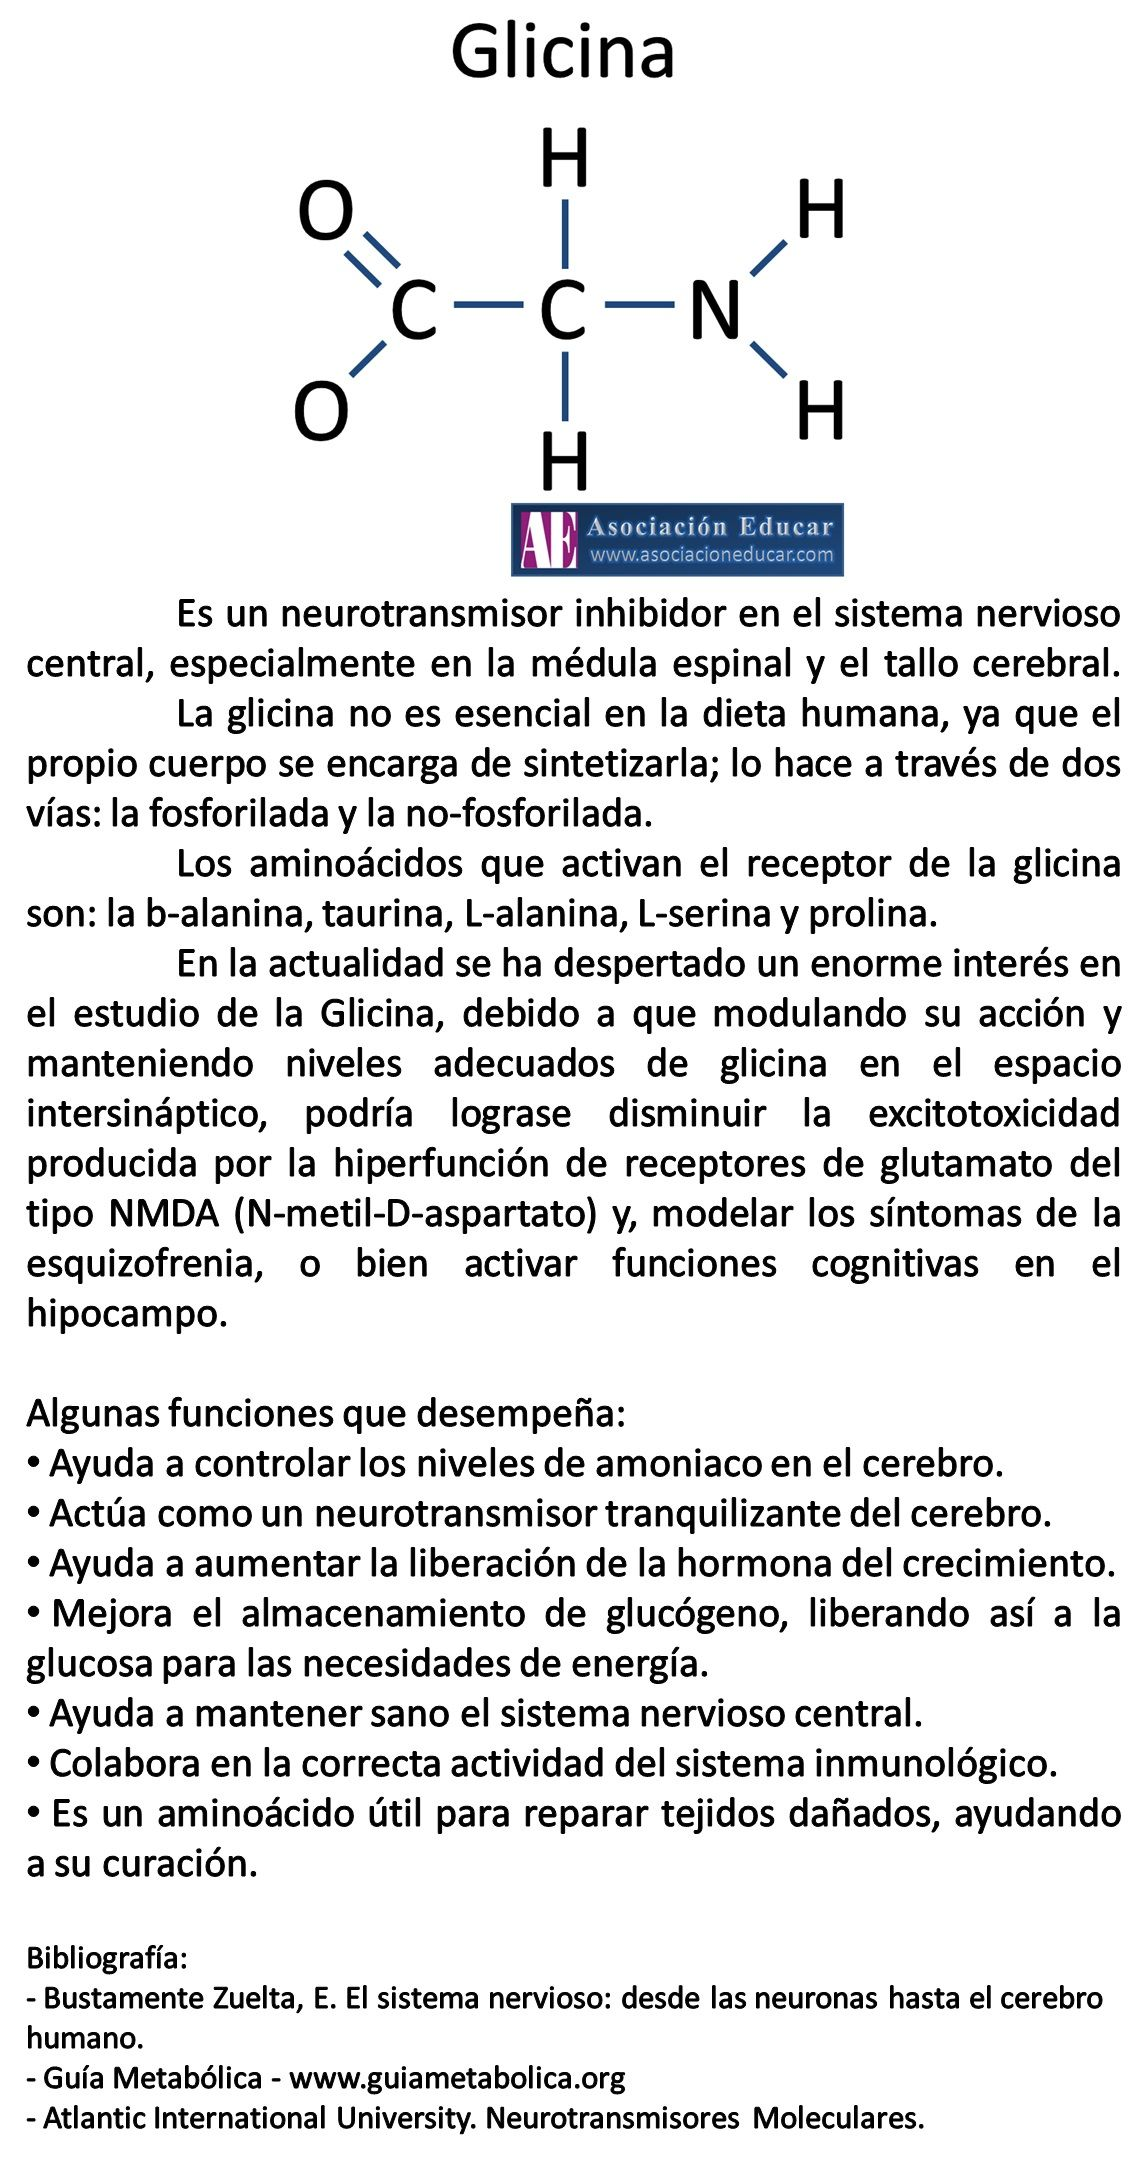 Infografía Neurociencias: Glicina. Material de uso libre, sólo se ...